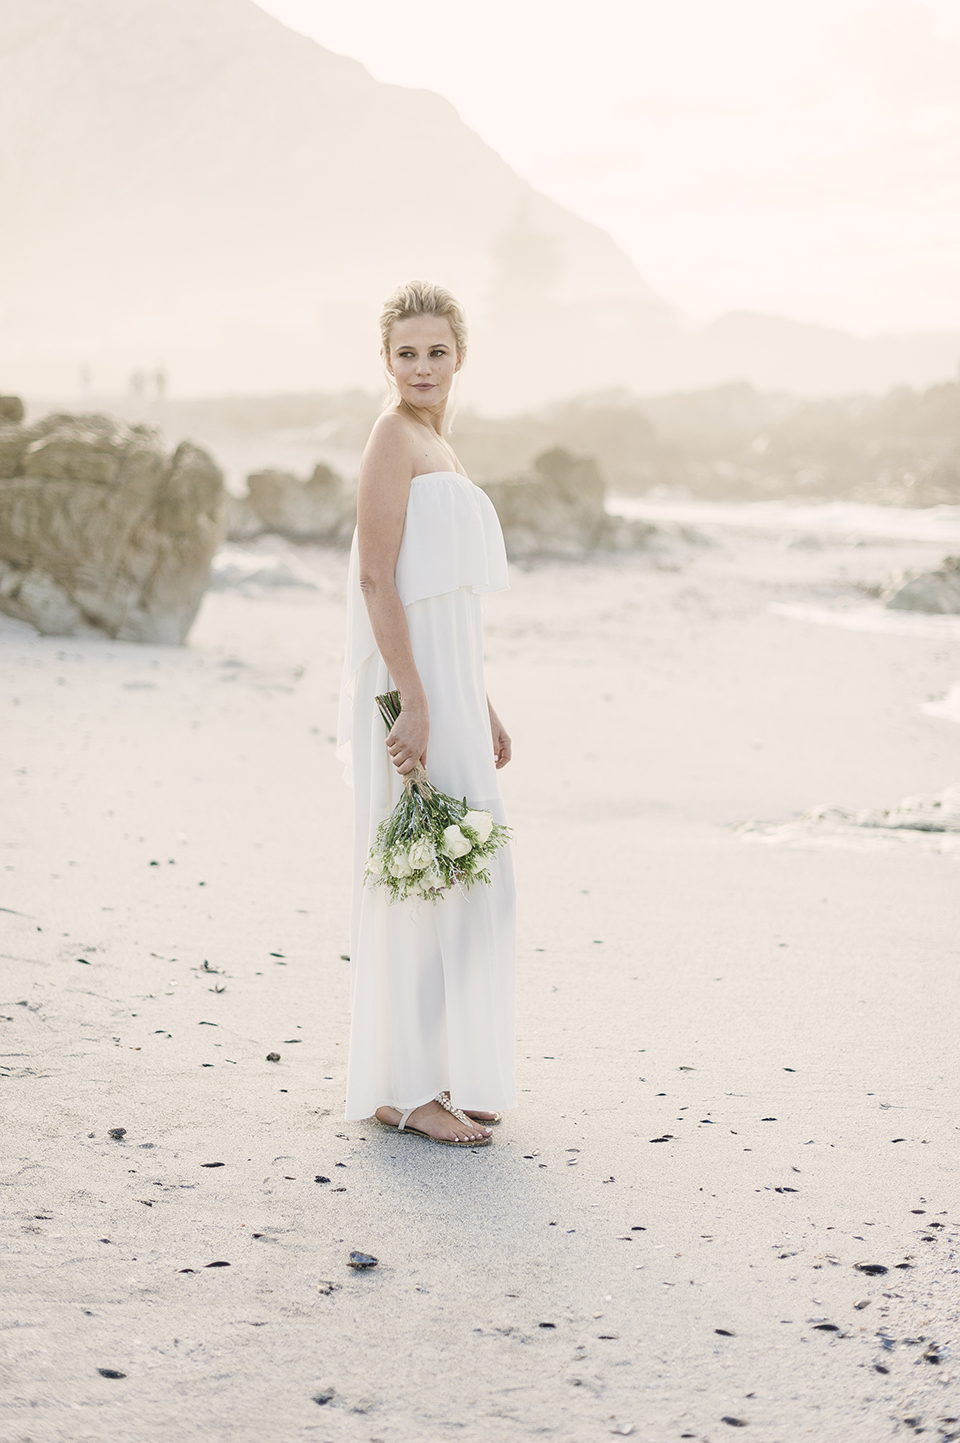 RyanParker_CapeTown_Photographer_Wedding_Hermanus_A&B_DSC_9394.jpg